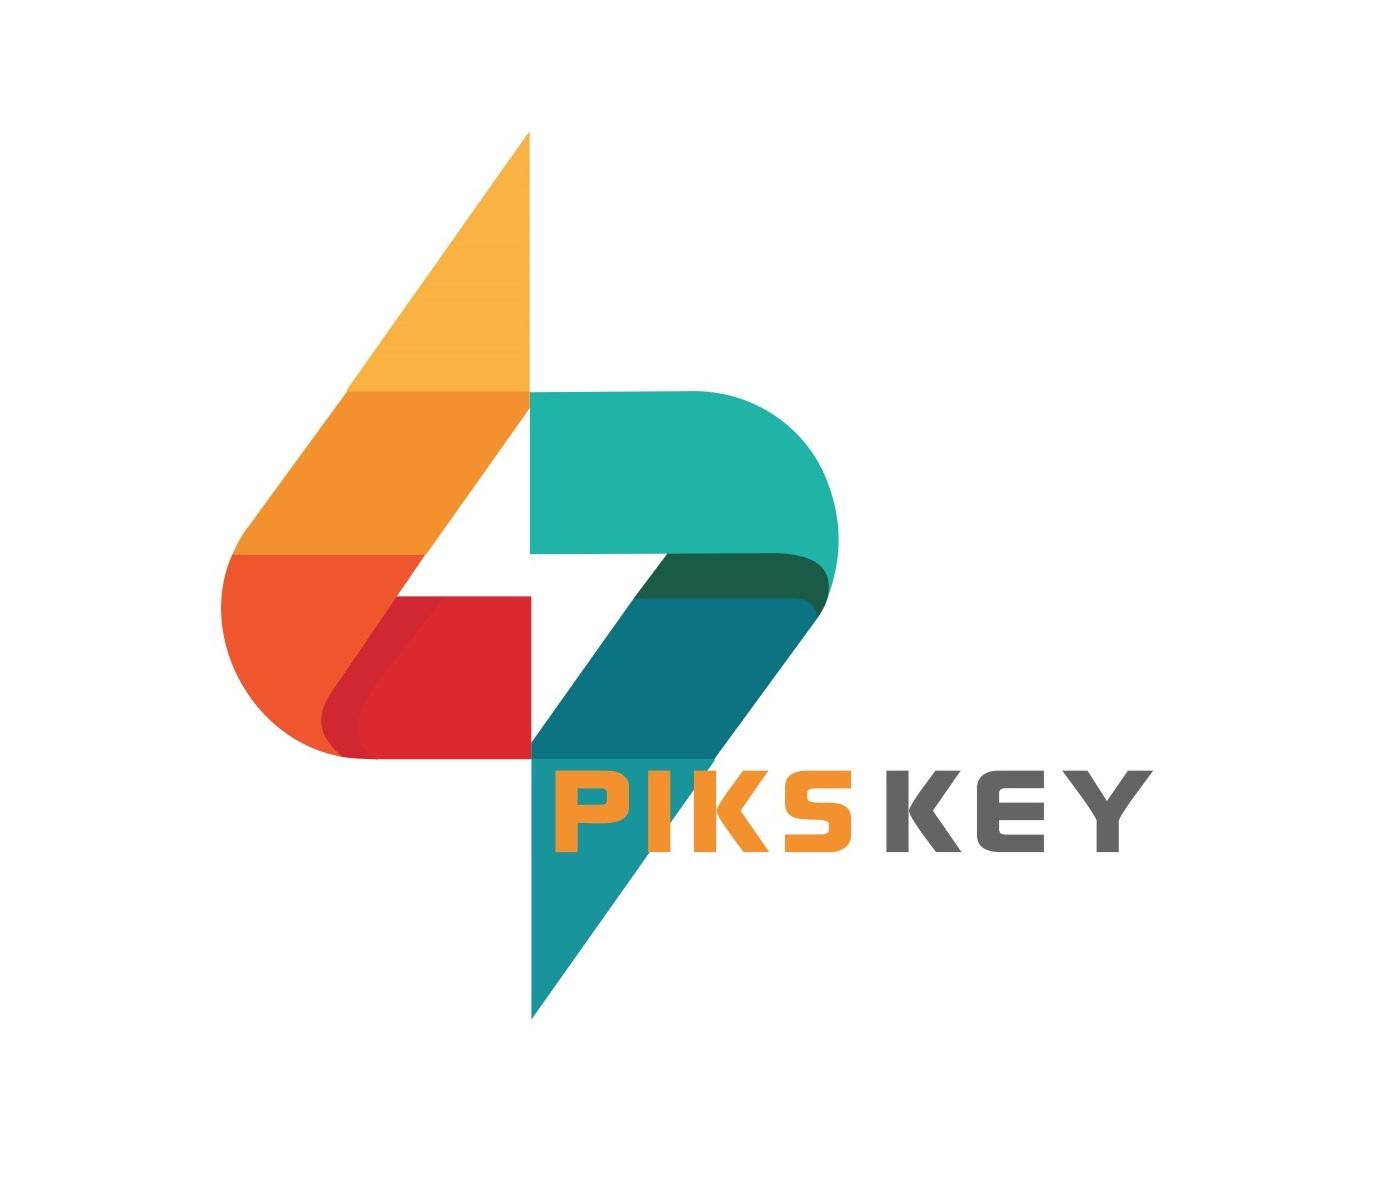 Pikskey